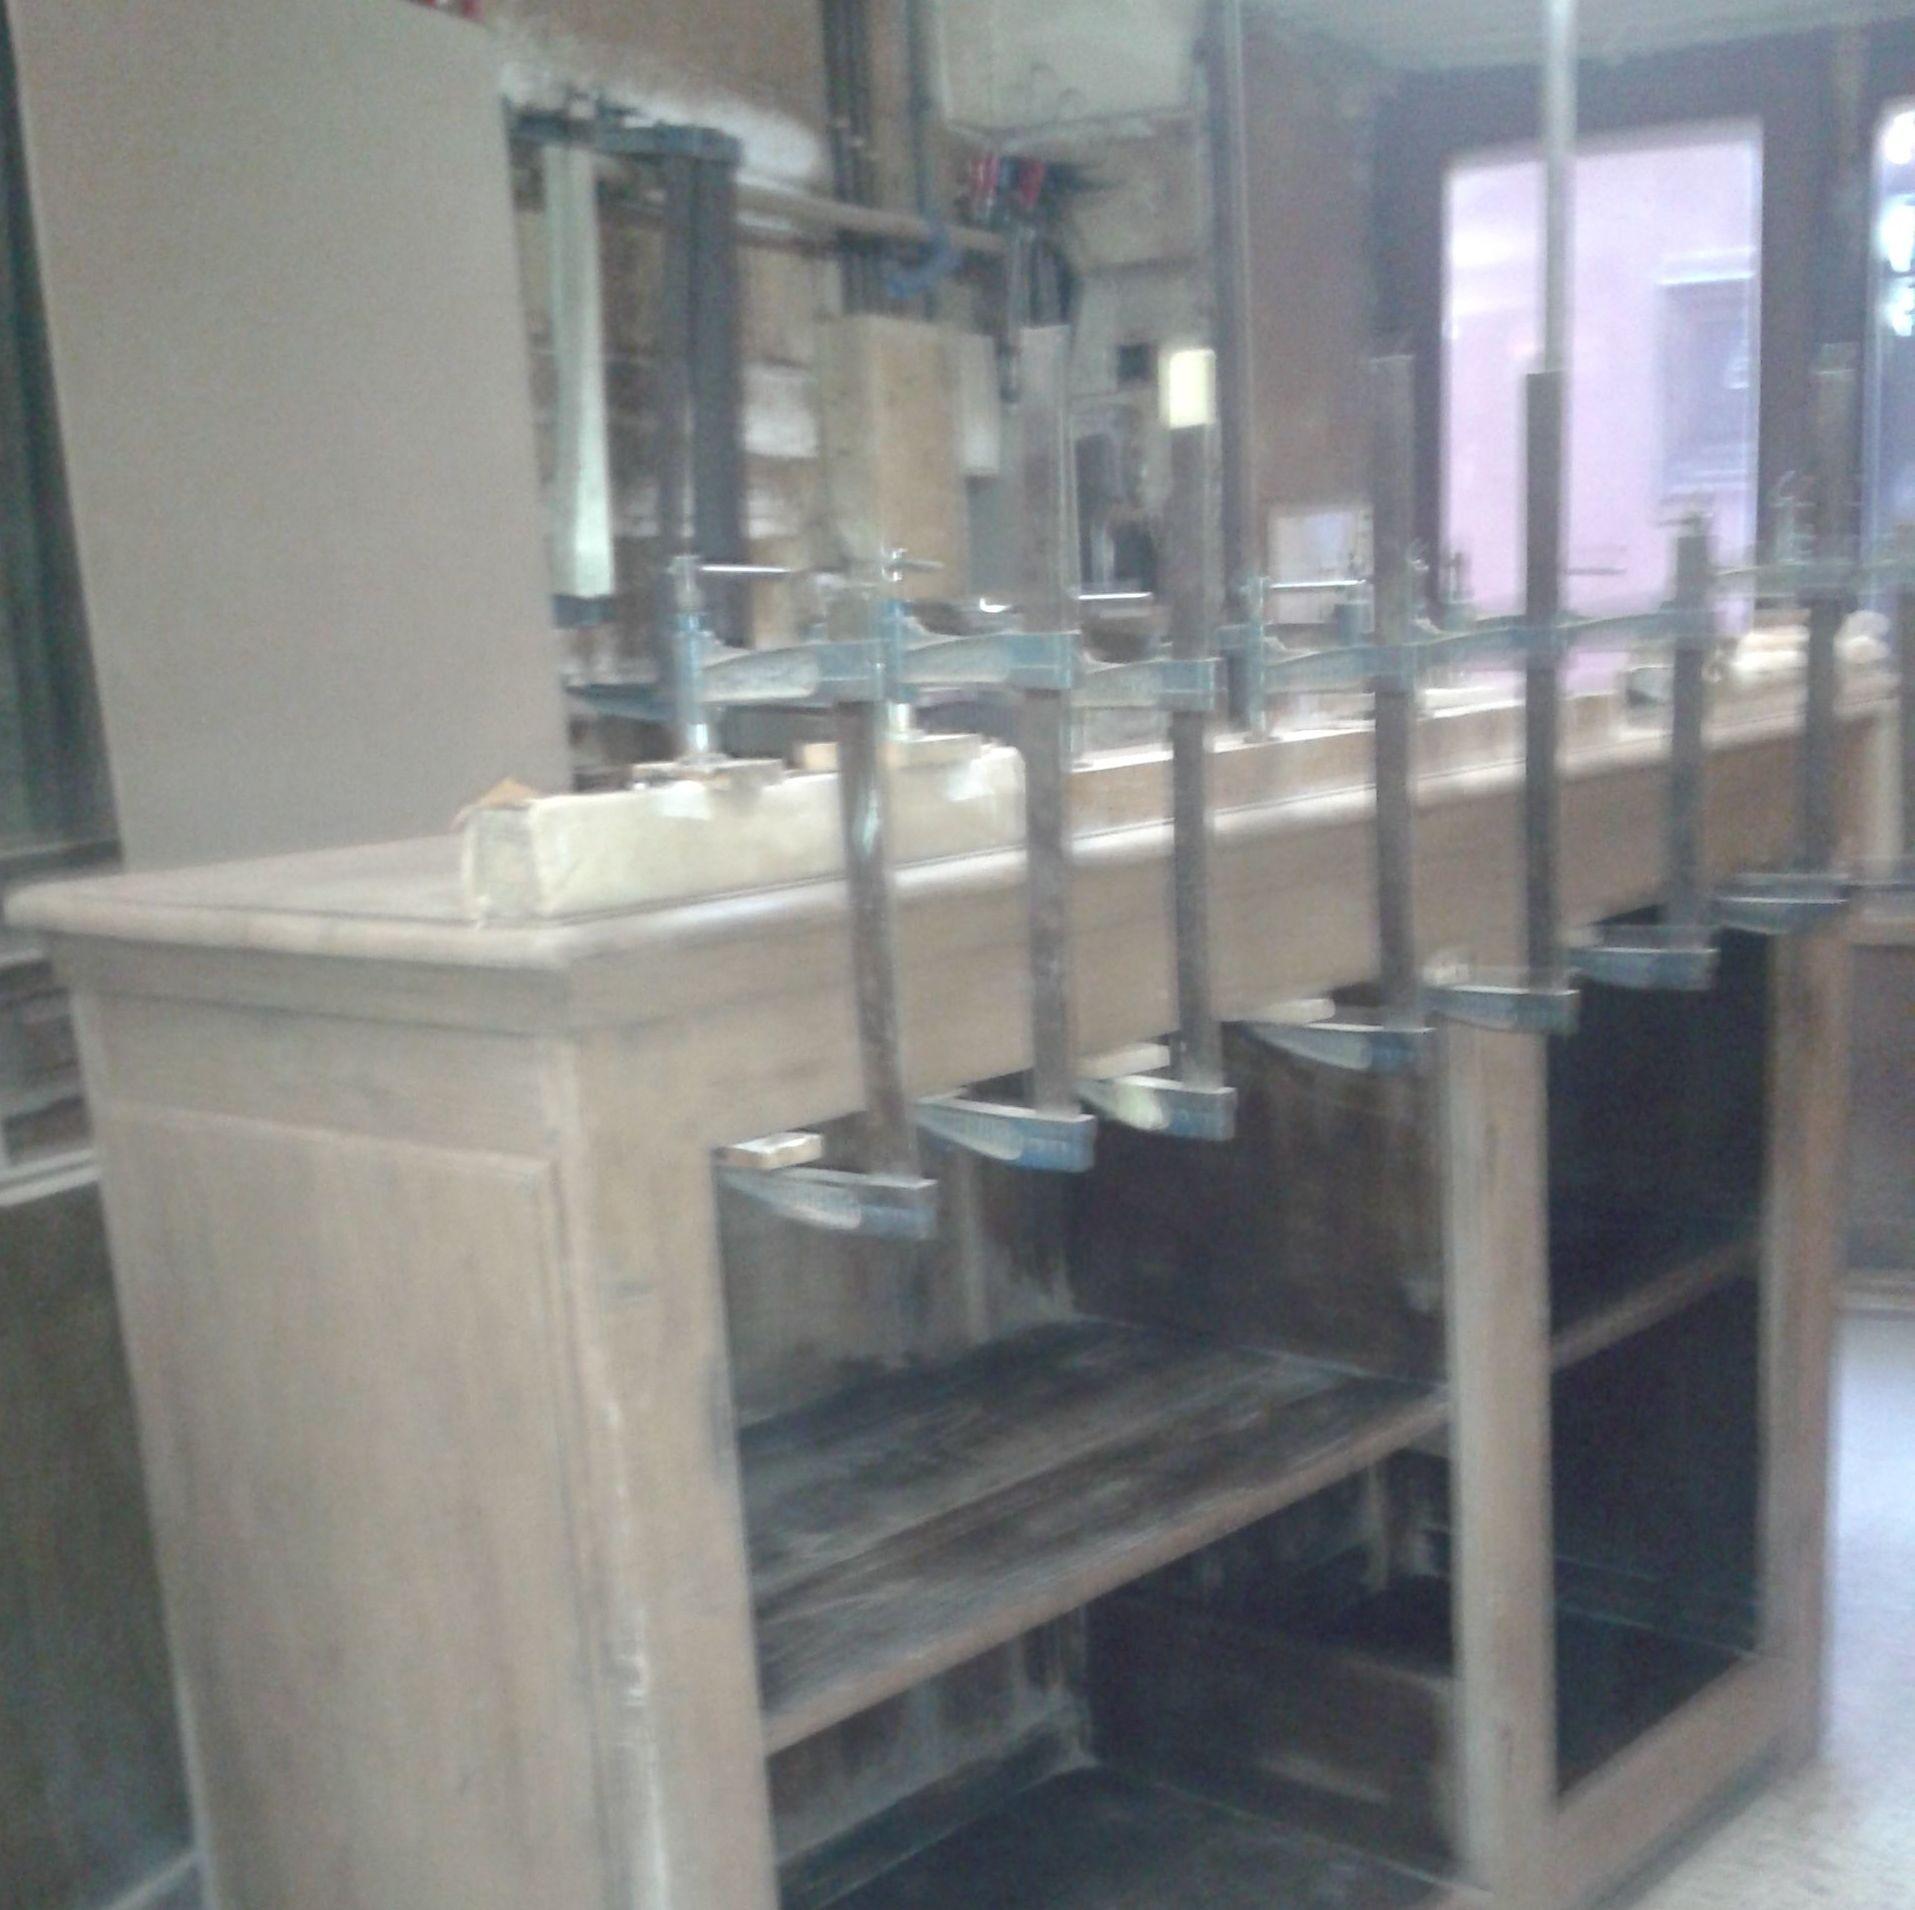 Foto 14 de Restauración de muebles en Pamplona | Lendik Restauración